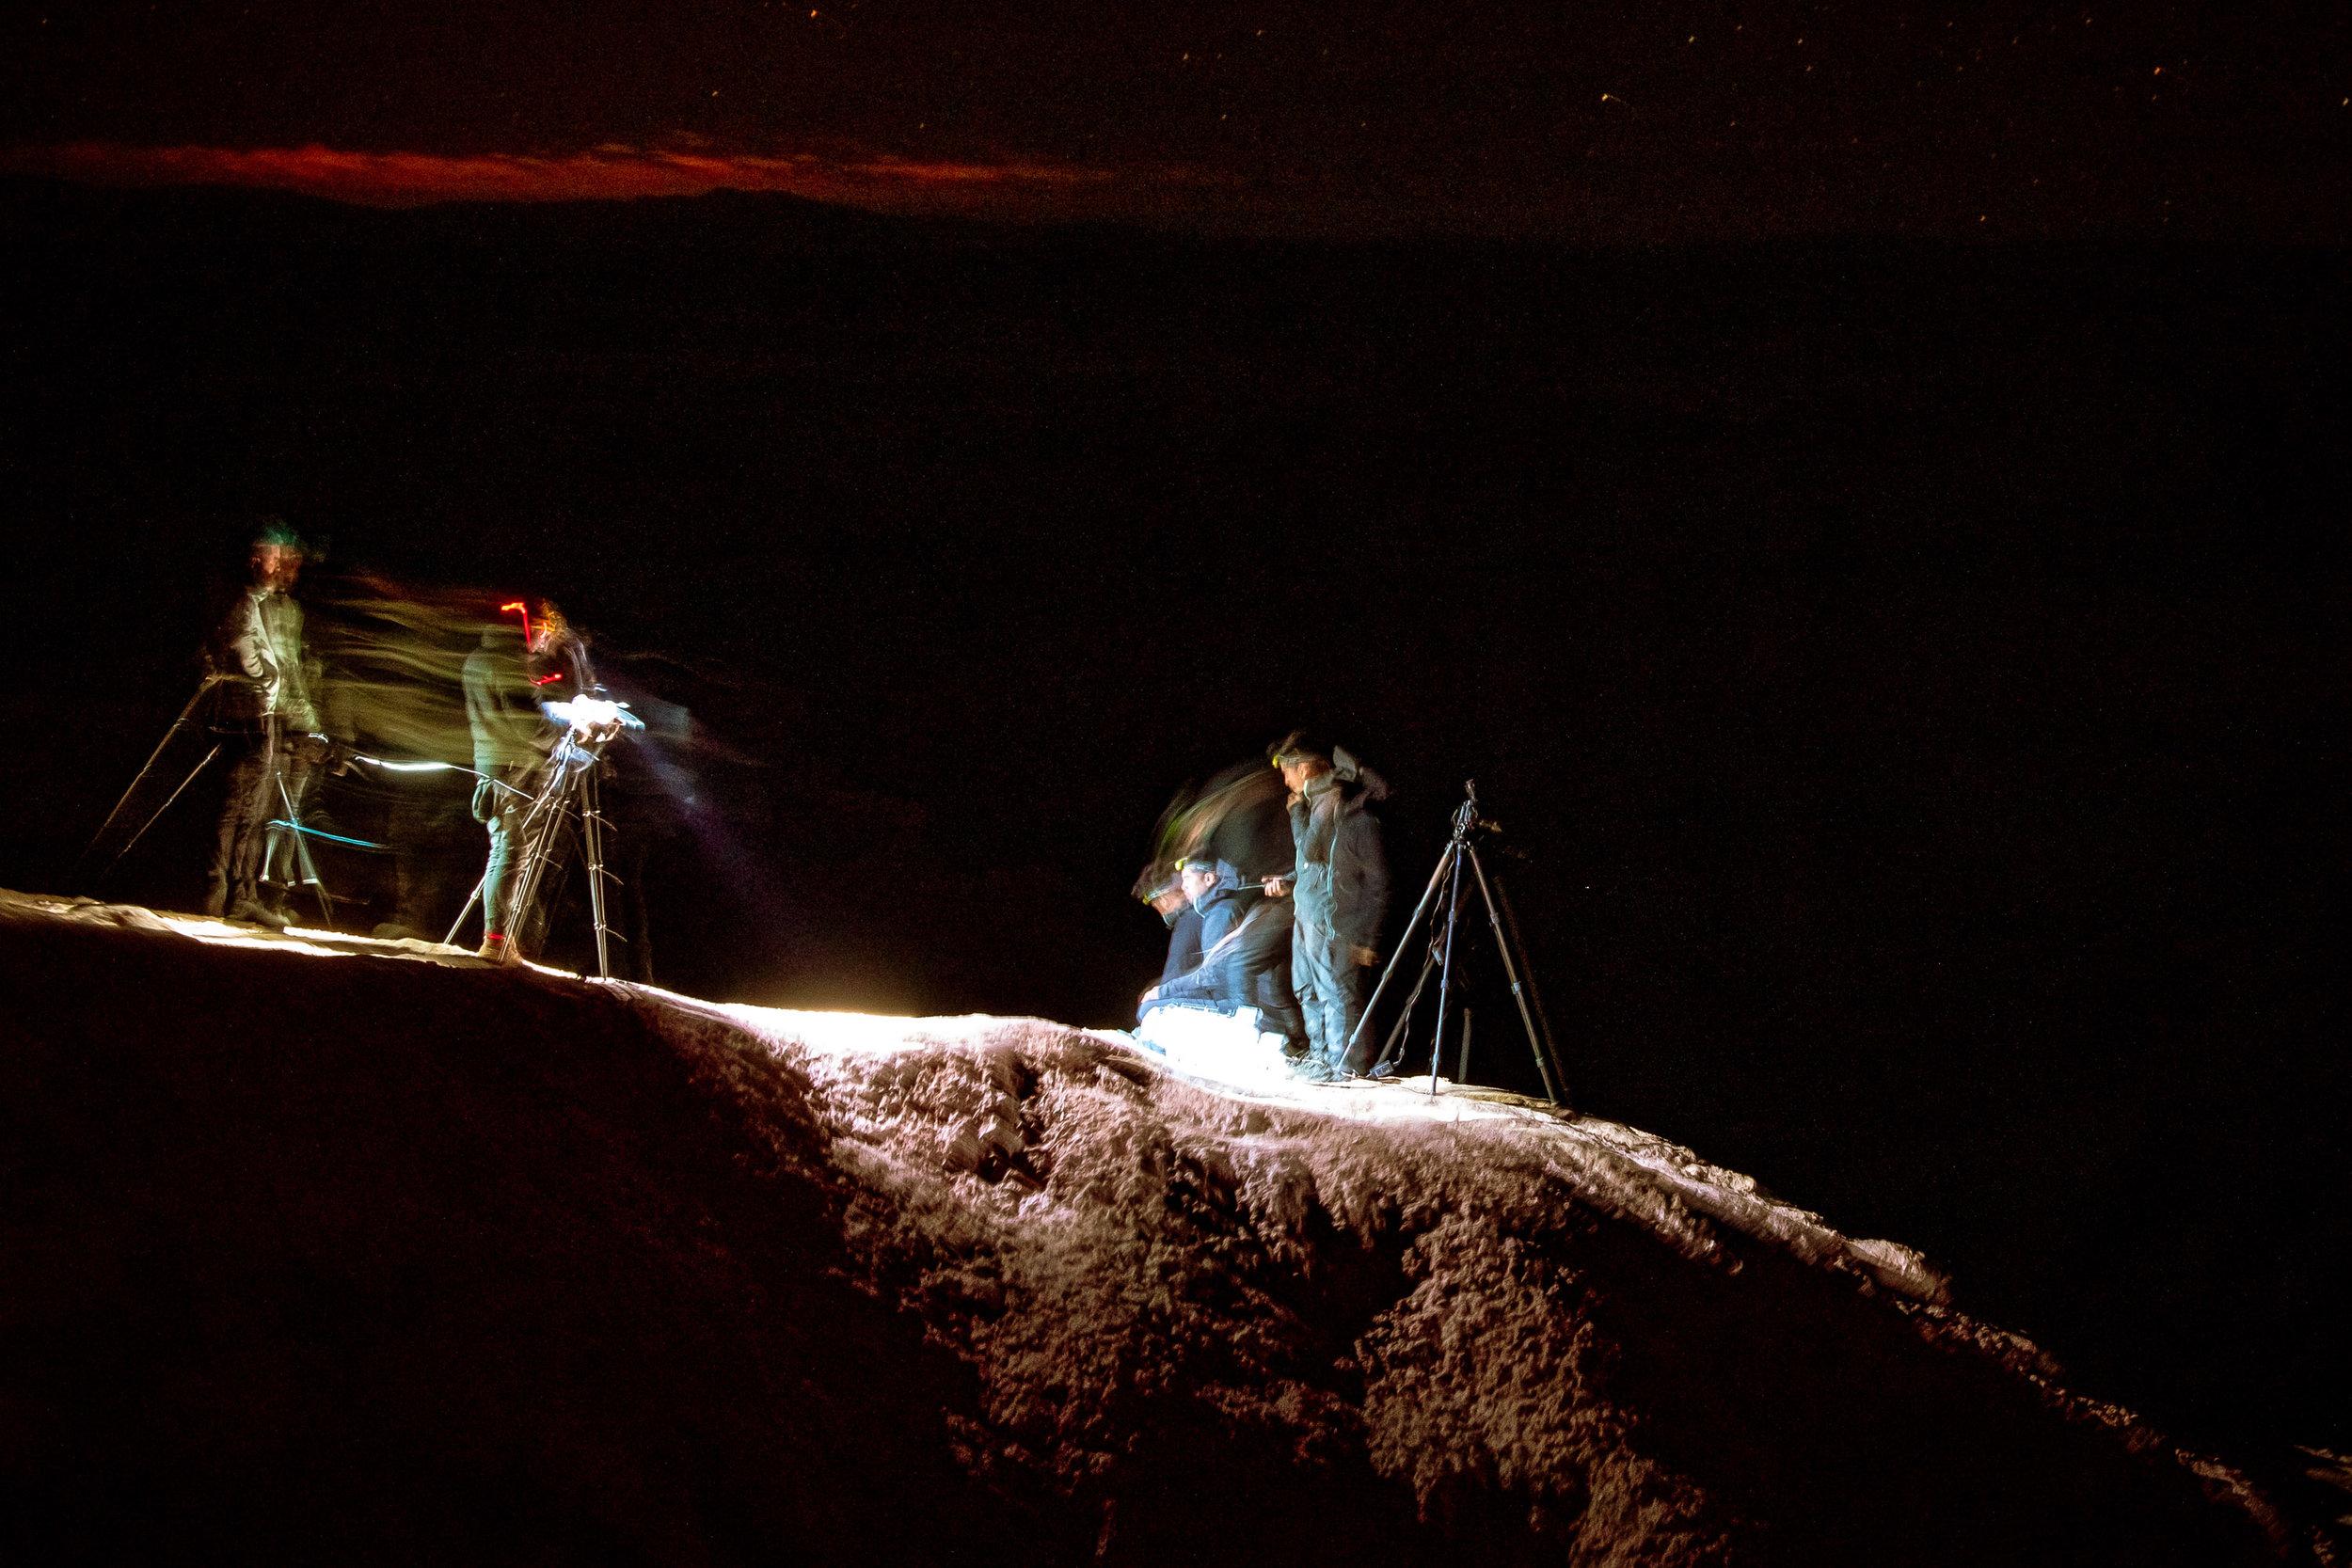 evanbdudley-Chile-Eclipse-19-0362.jpg